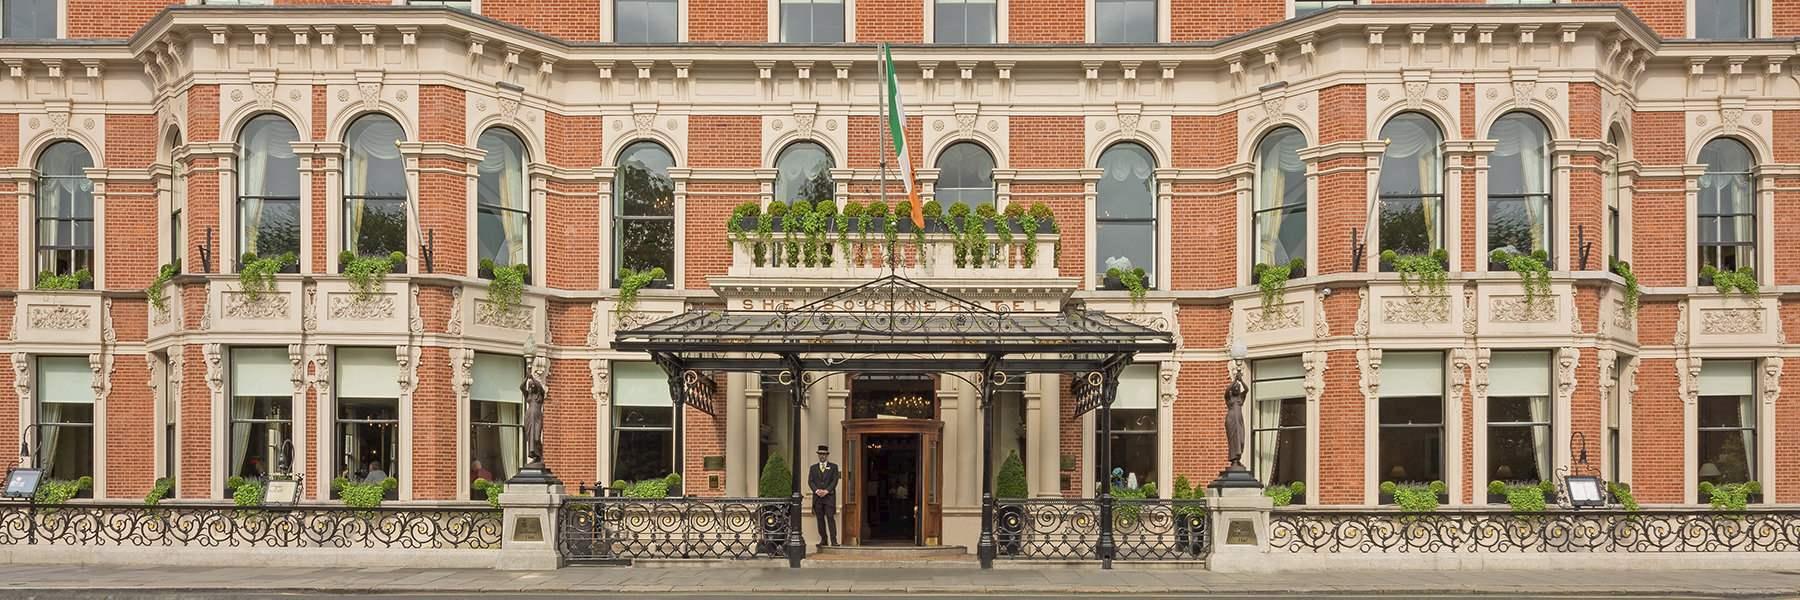 The Shelbourne Hotel, Dublin